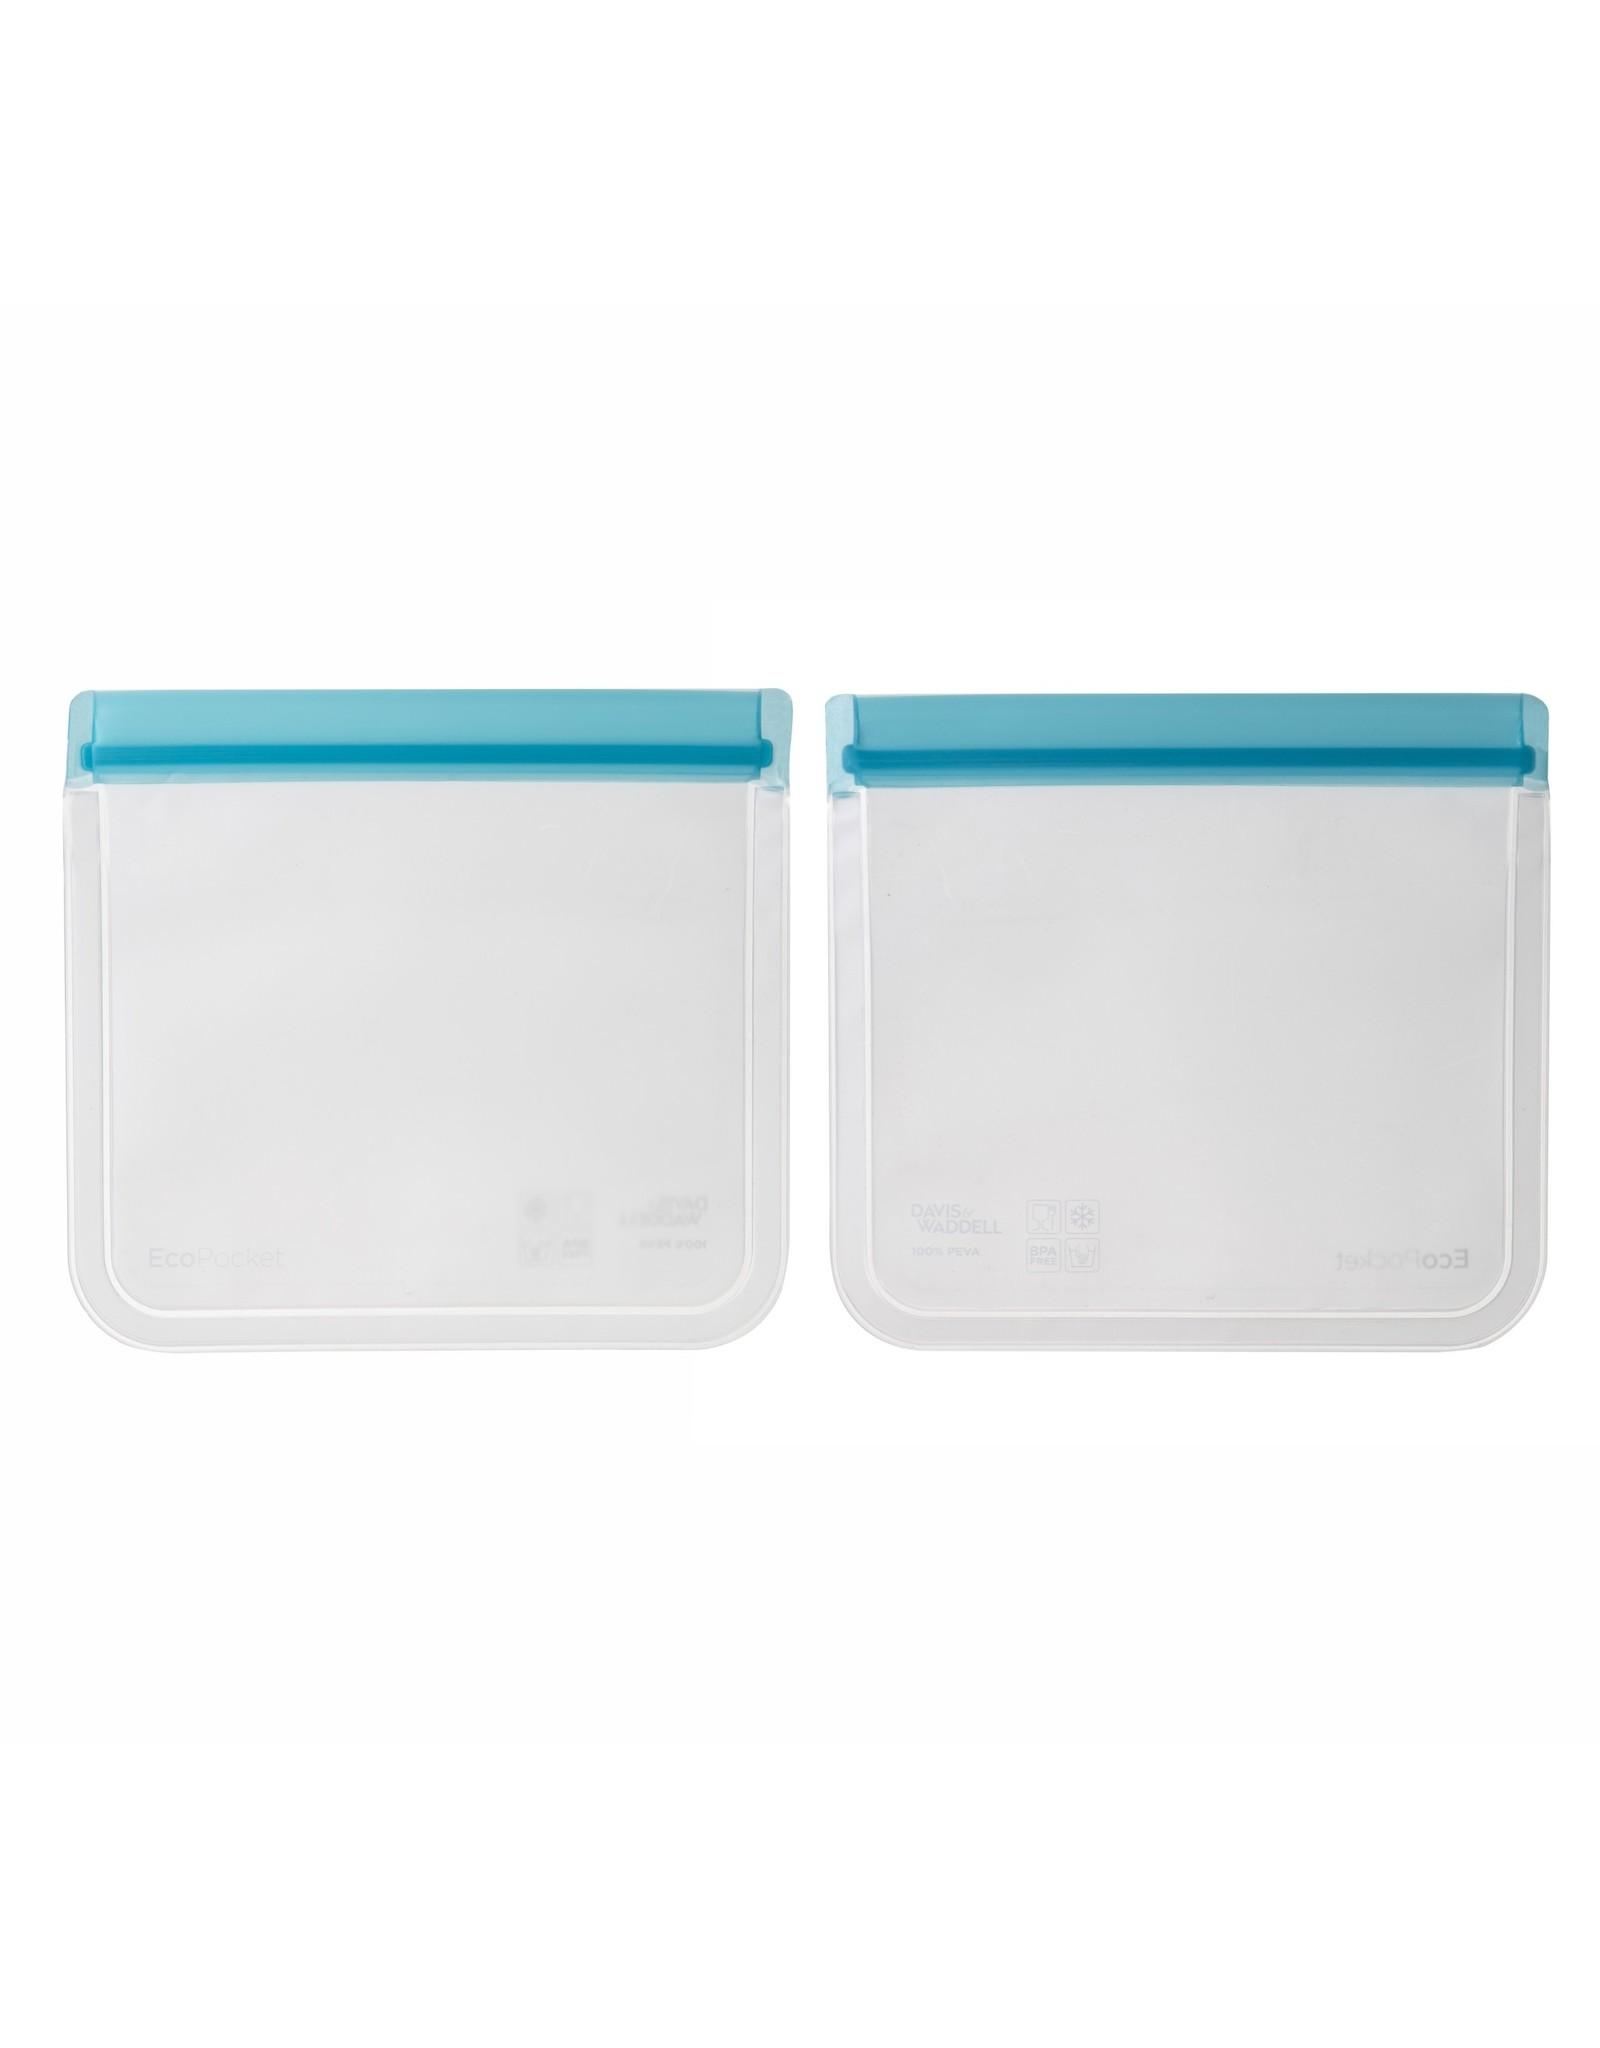 Davis & Waddell Ecopocket Set of 2 Storage Pockets